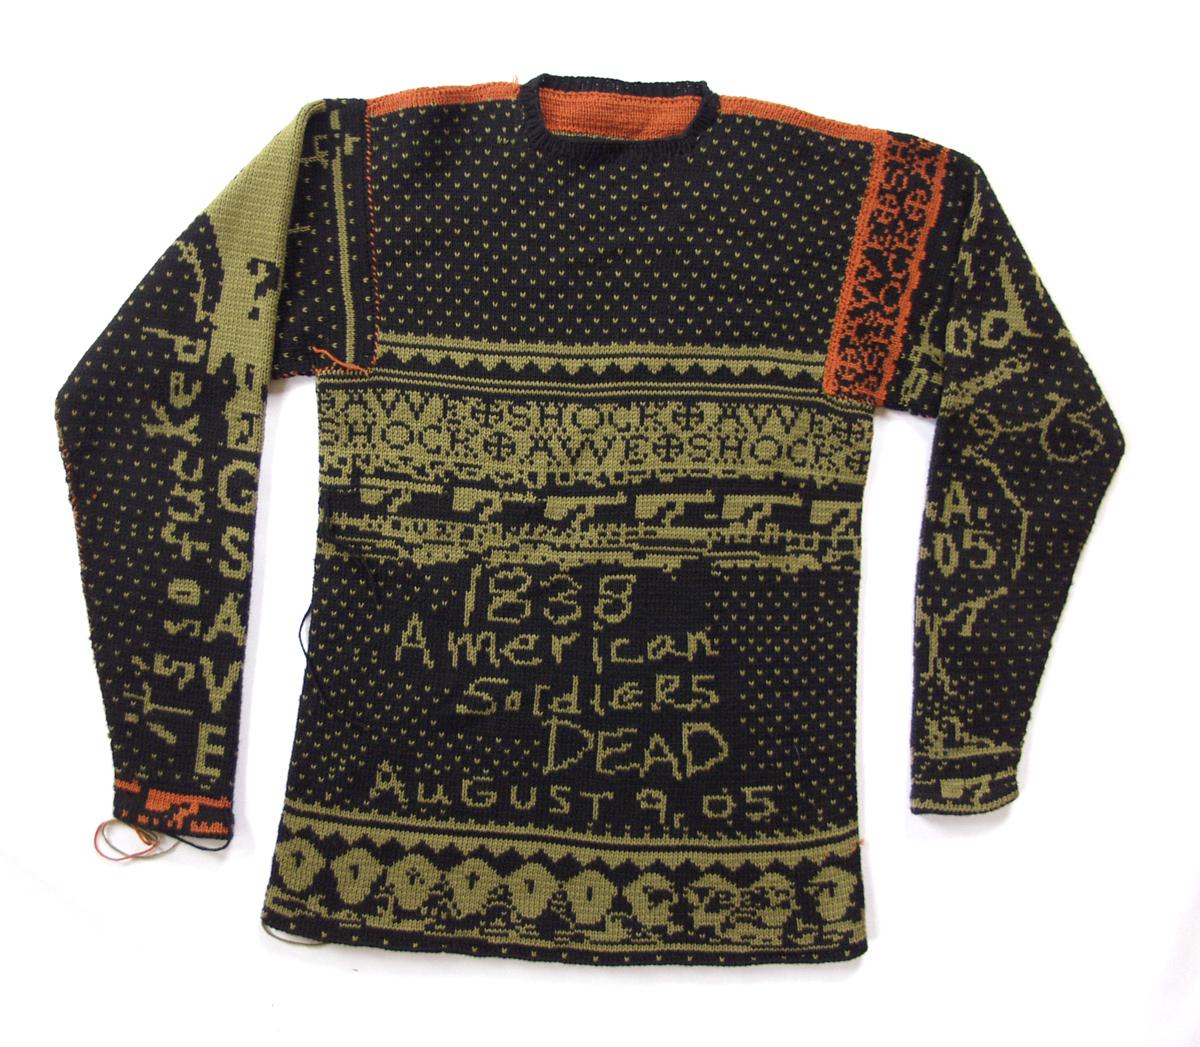 bodycountsweater.jpg